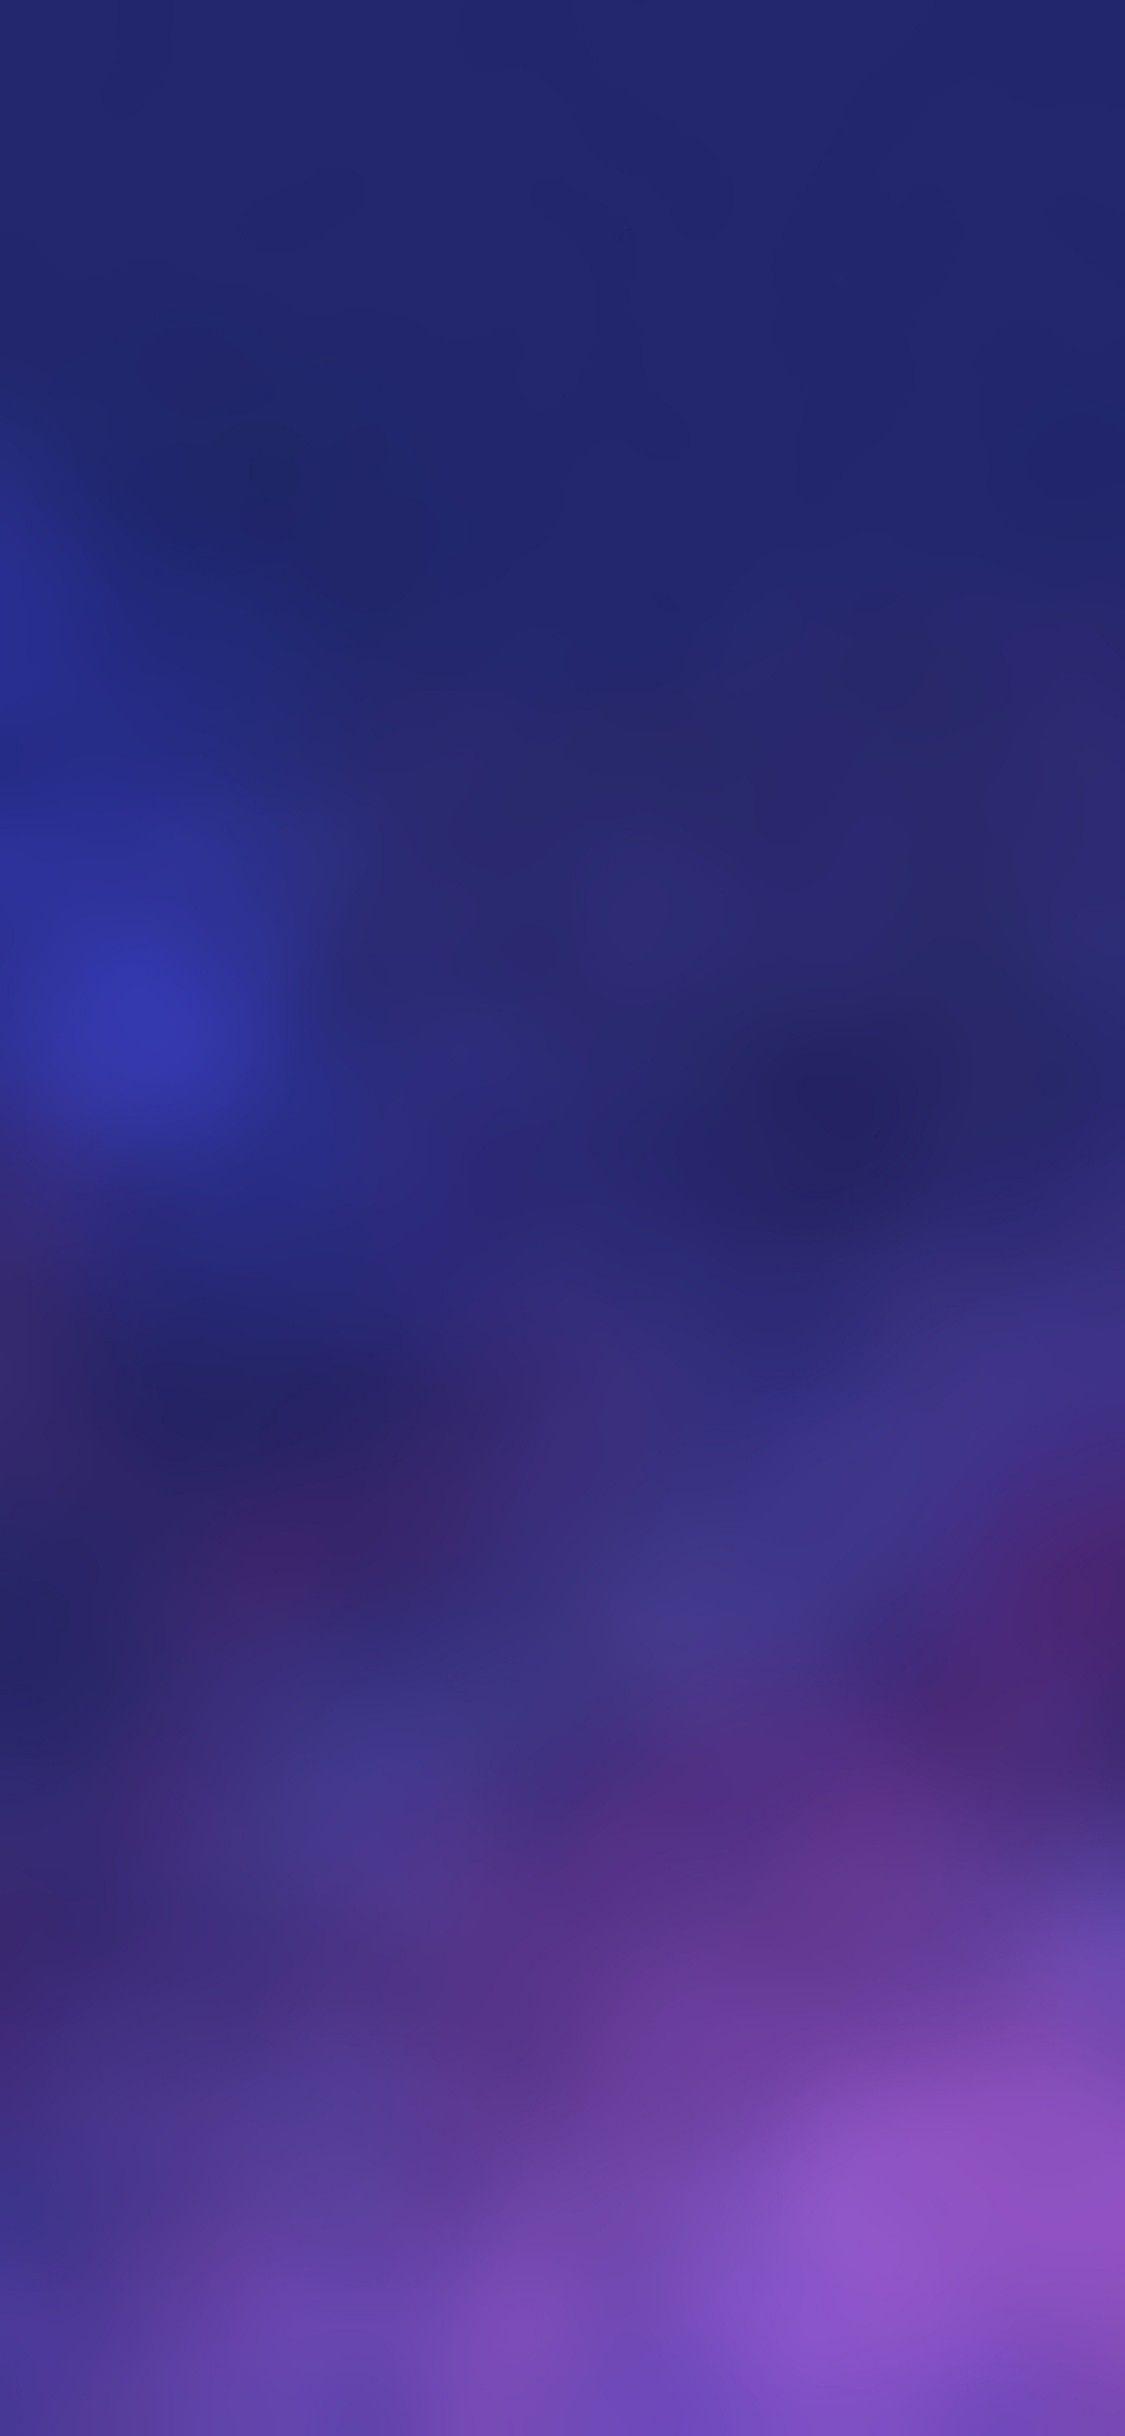 Blue Violet Wallpaper Galaxy Colour Abstract Digital Art S8 S9 Walls Samsung Galaxy Iphone Dynamic Wallpaper Purple Ombre Wallpaper Ombre Wallpapers